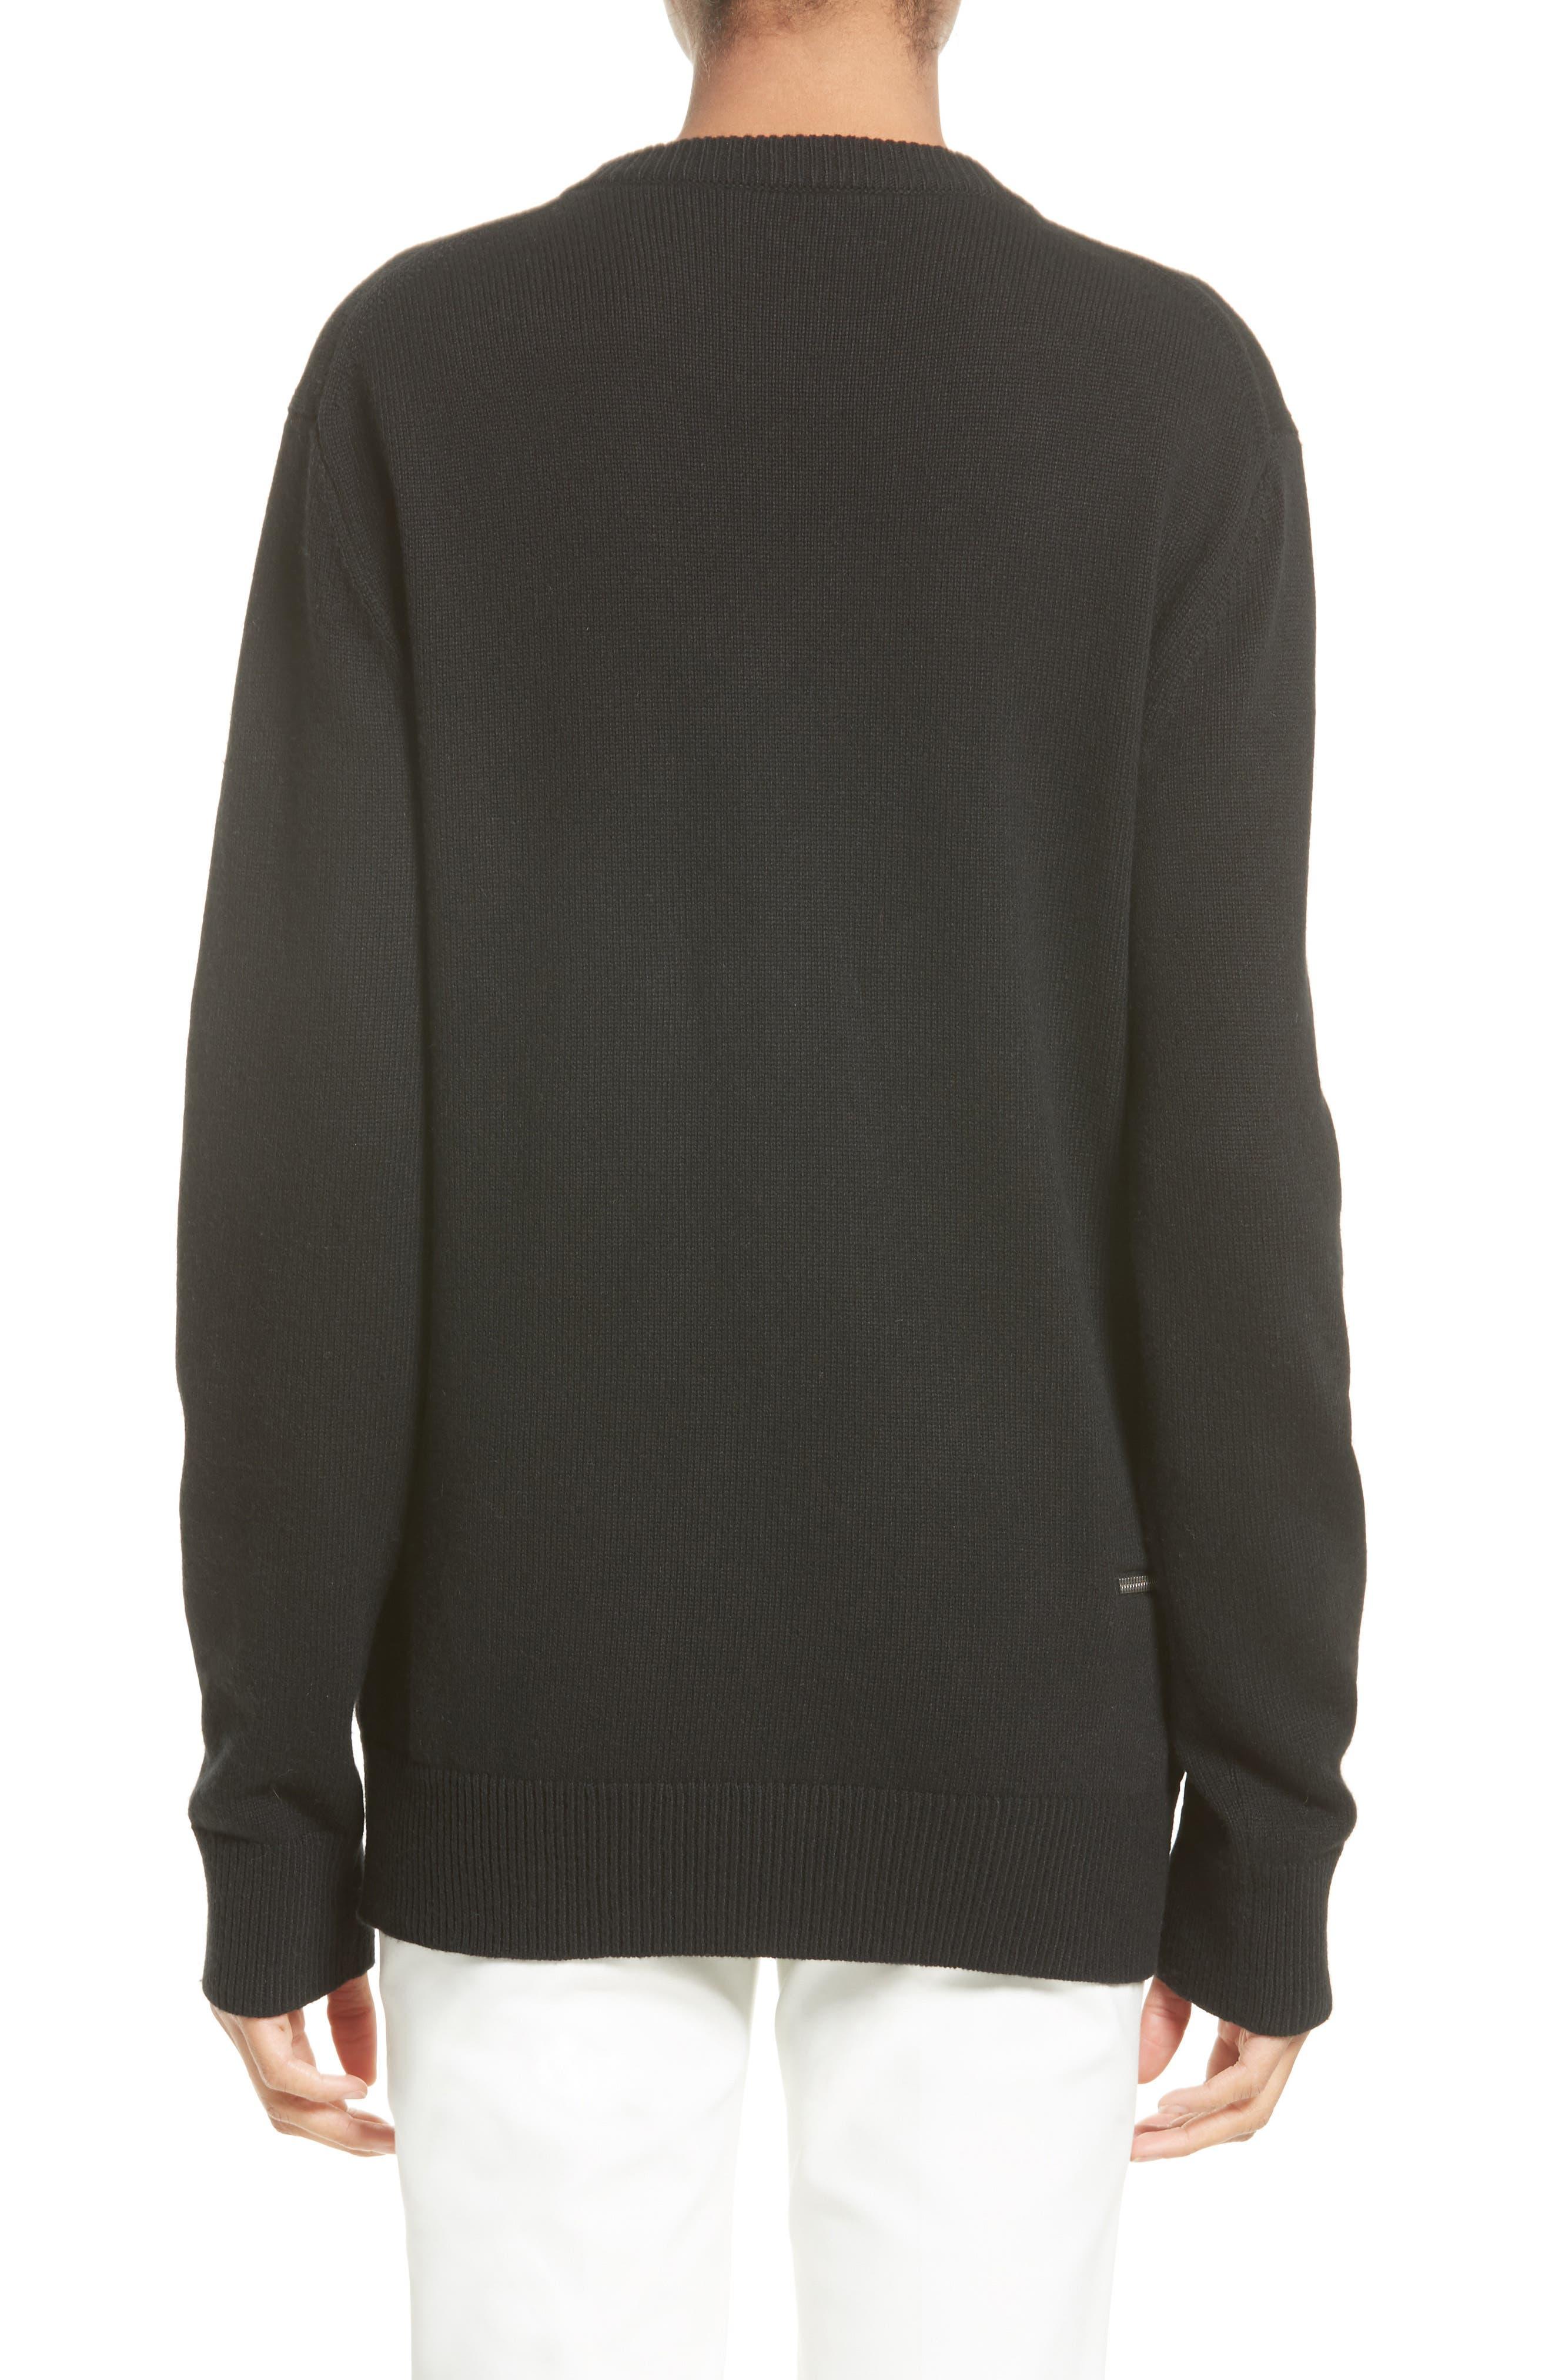 Alternate Image 2  - Michael Kors Zip Detail Cashmere & Cotton Sweater